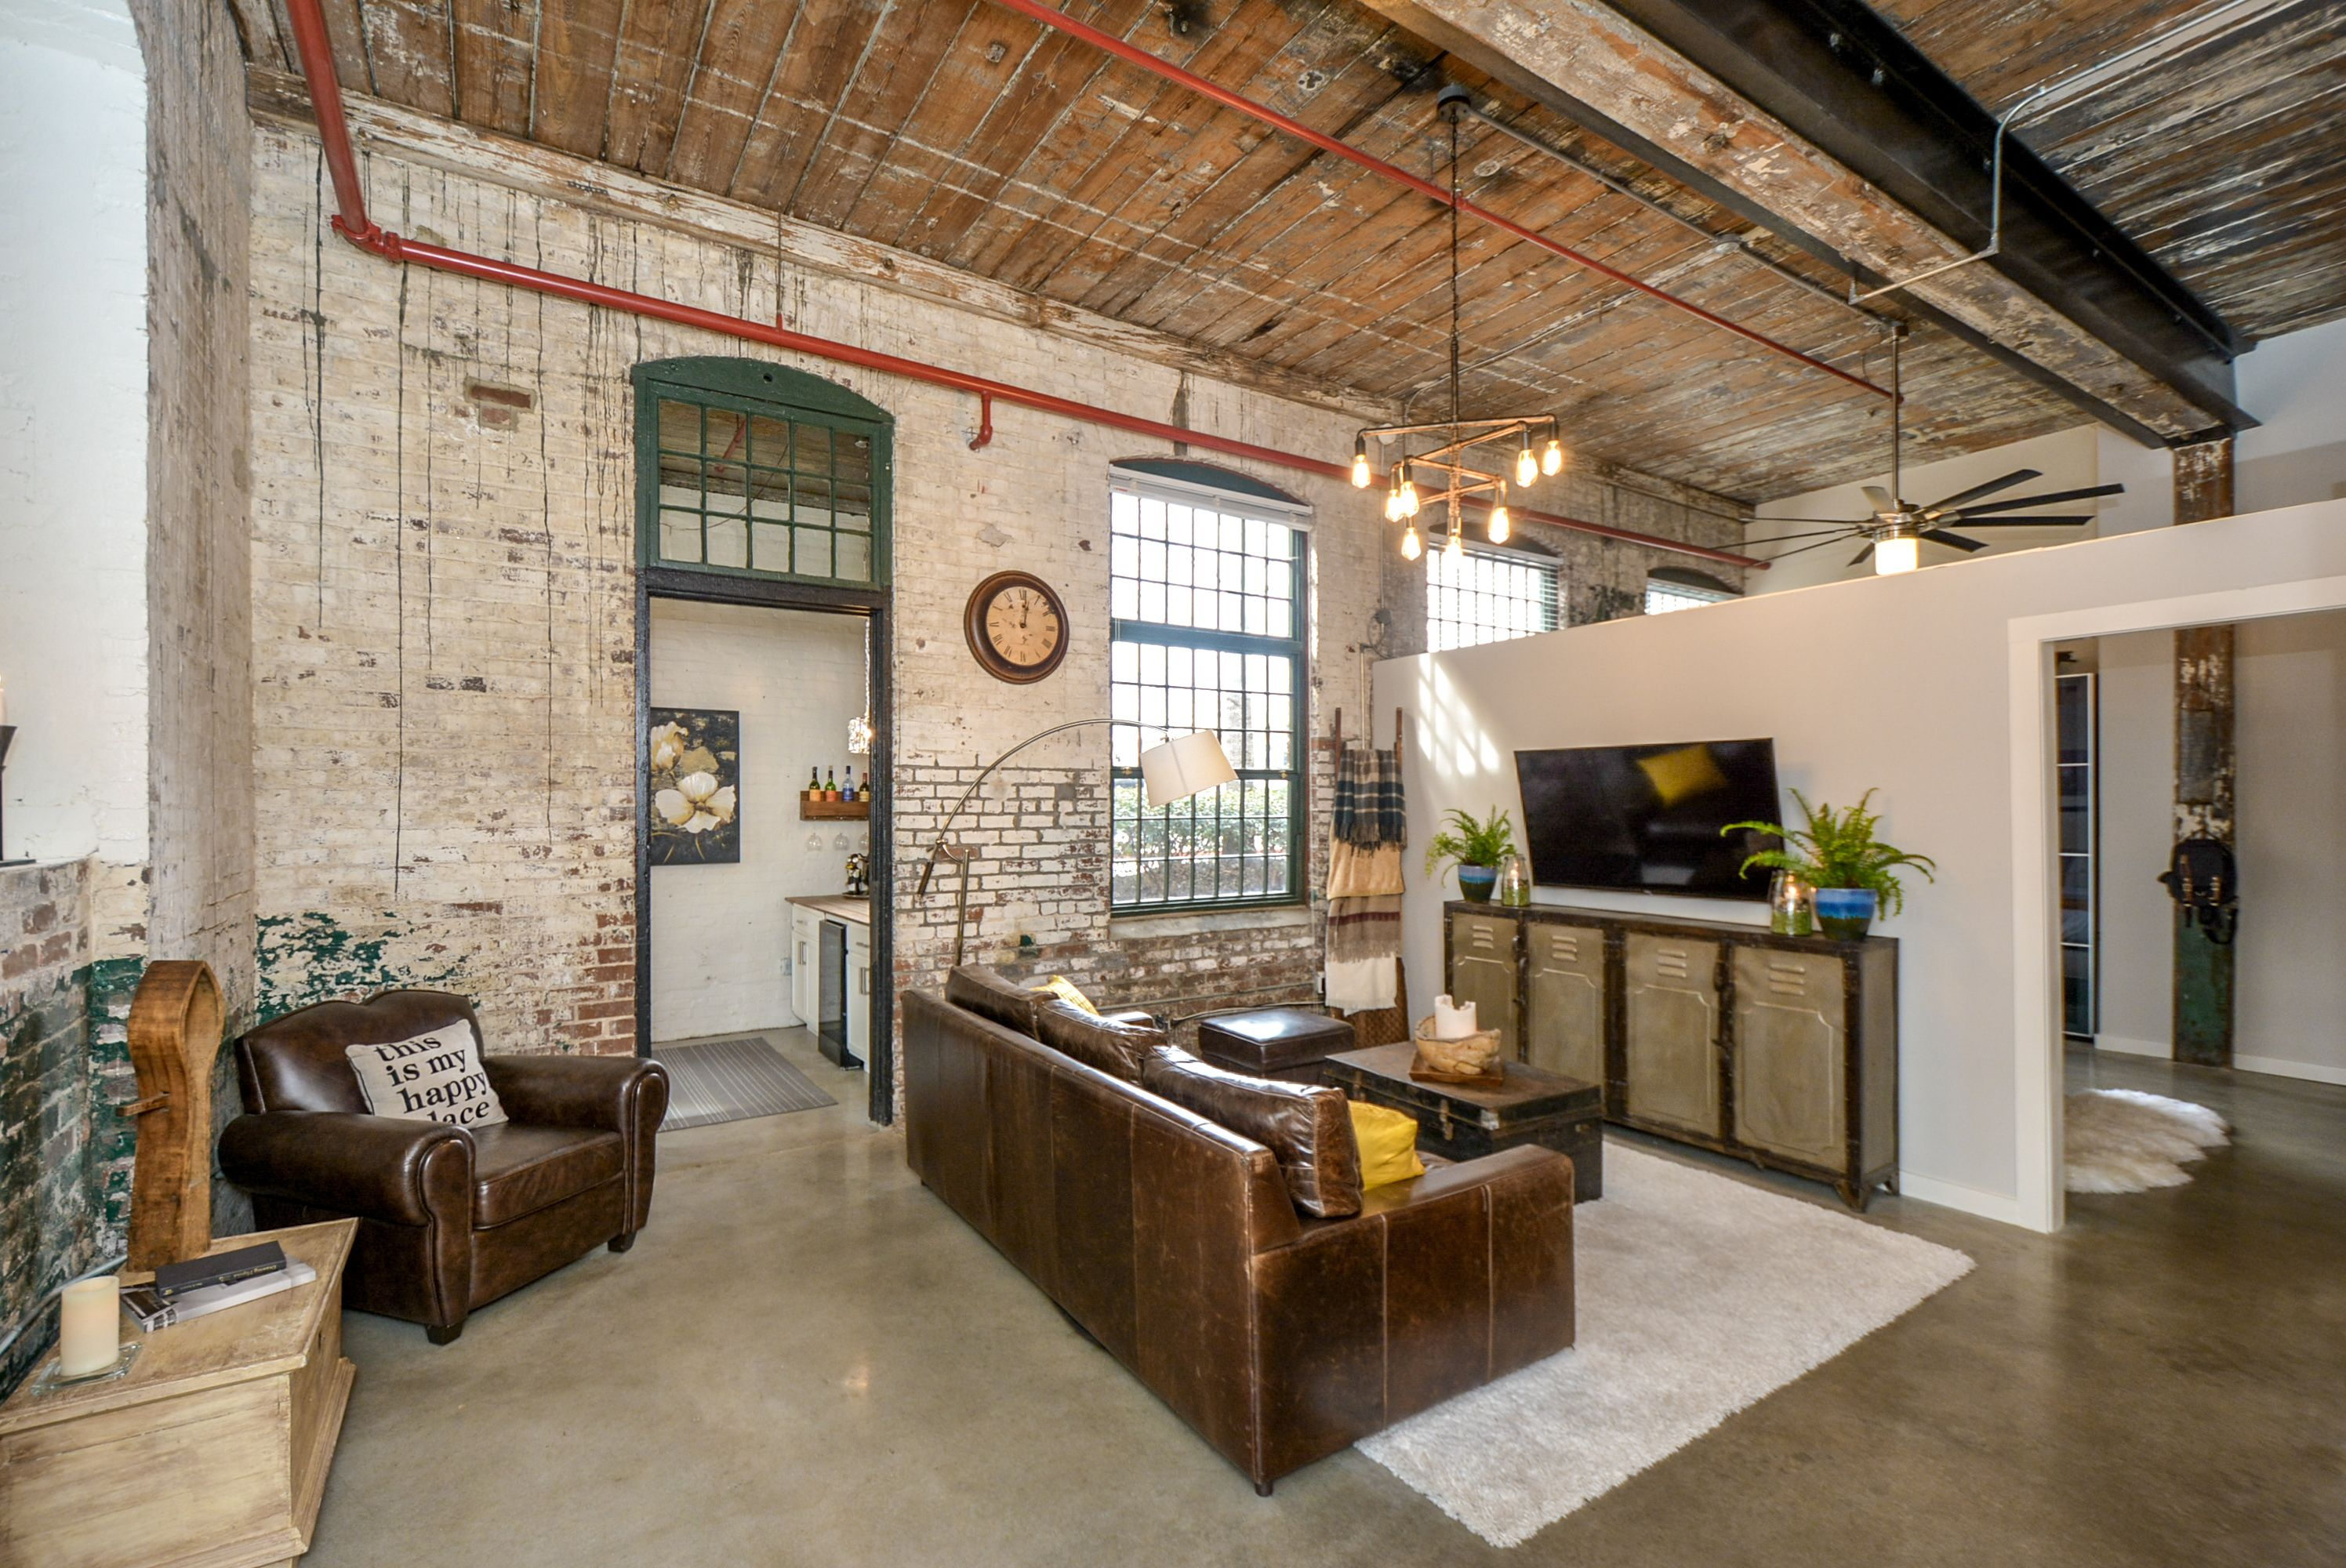 JUST LISTED Loft Condo in Historic Fulton Cotton Mill